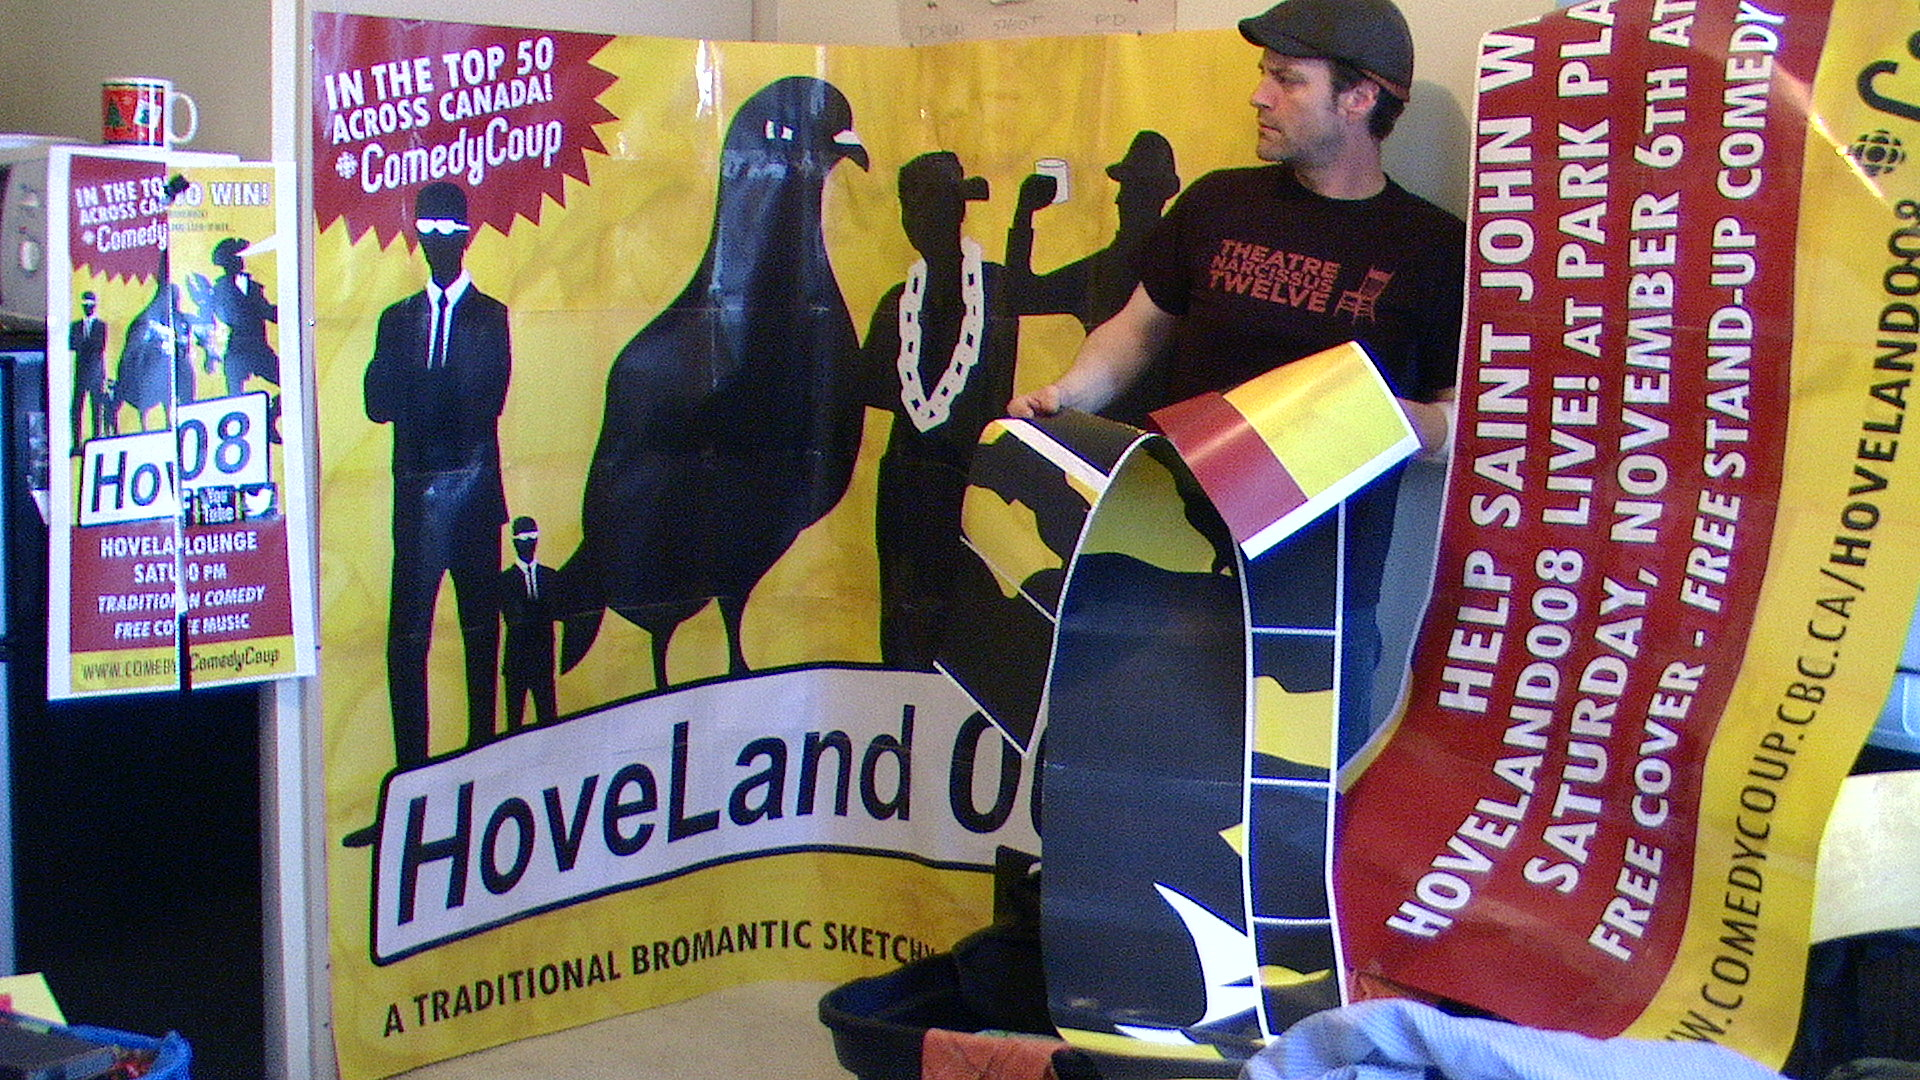 HoveLand008 Print Promotion